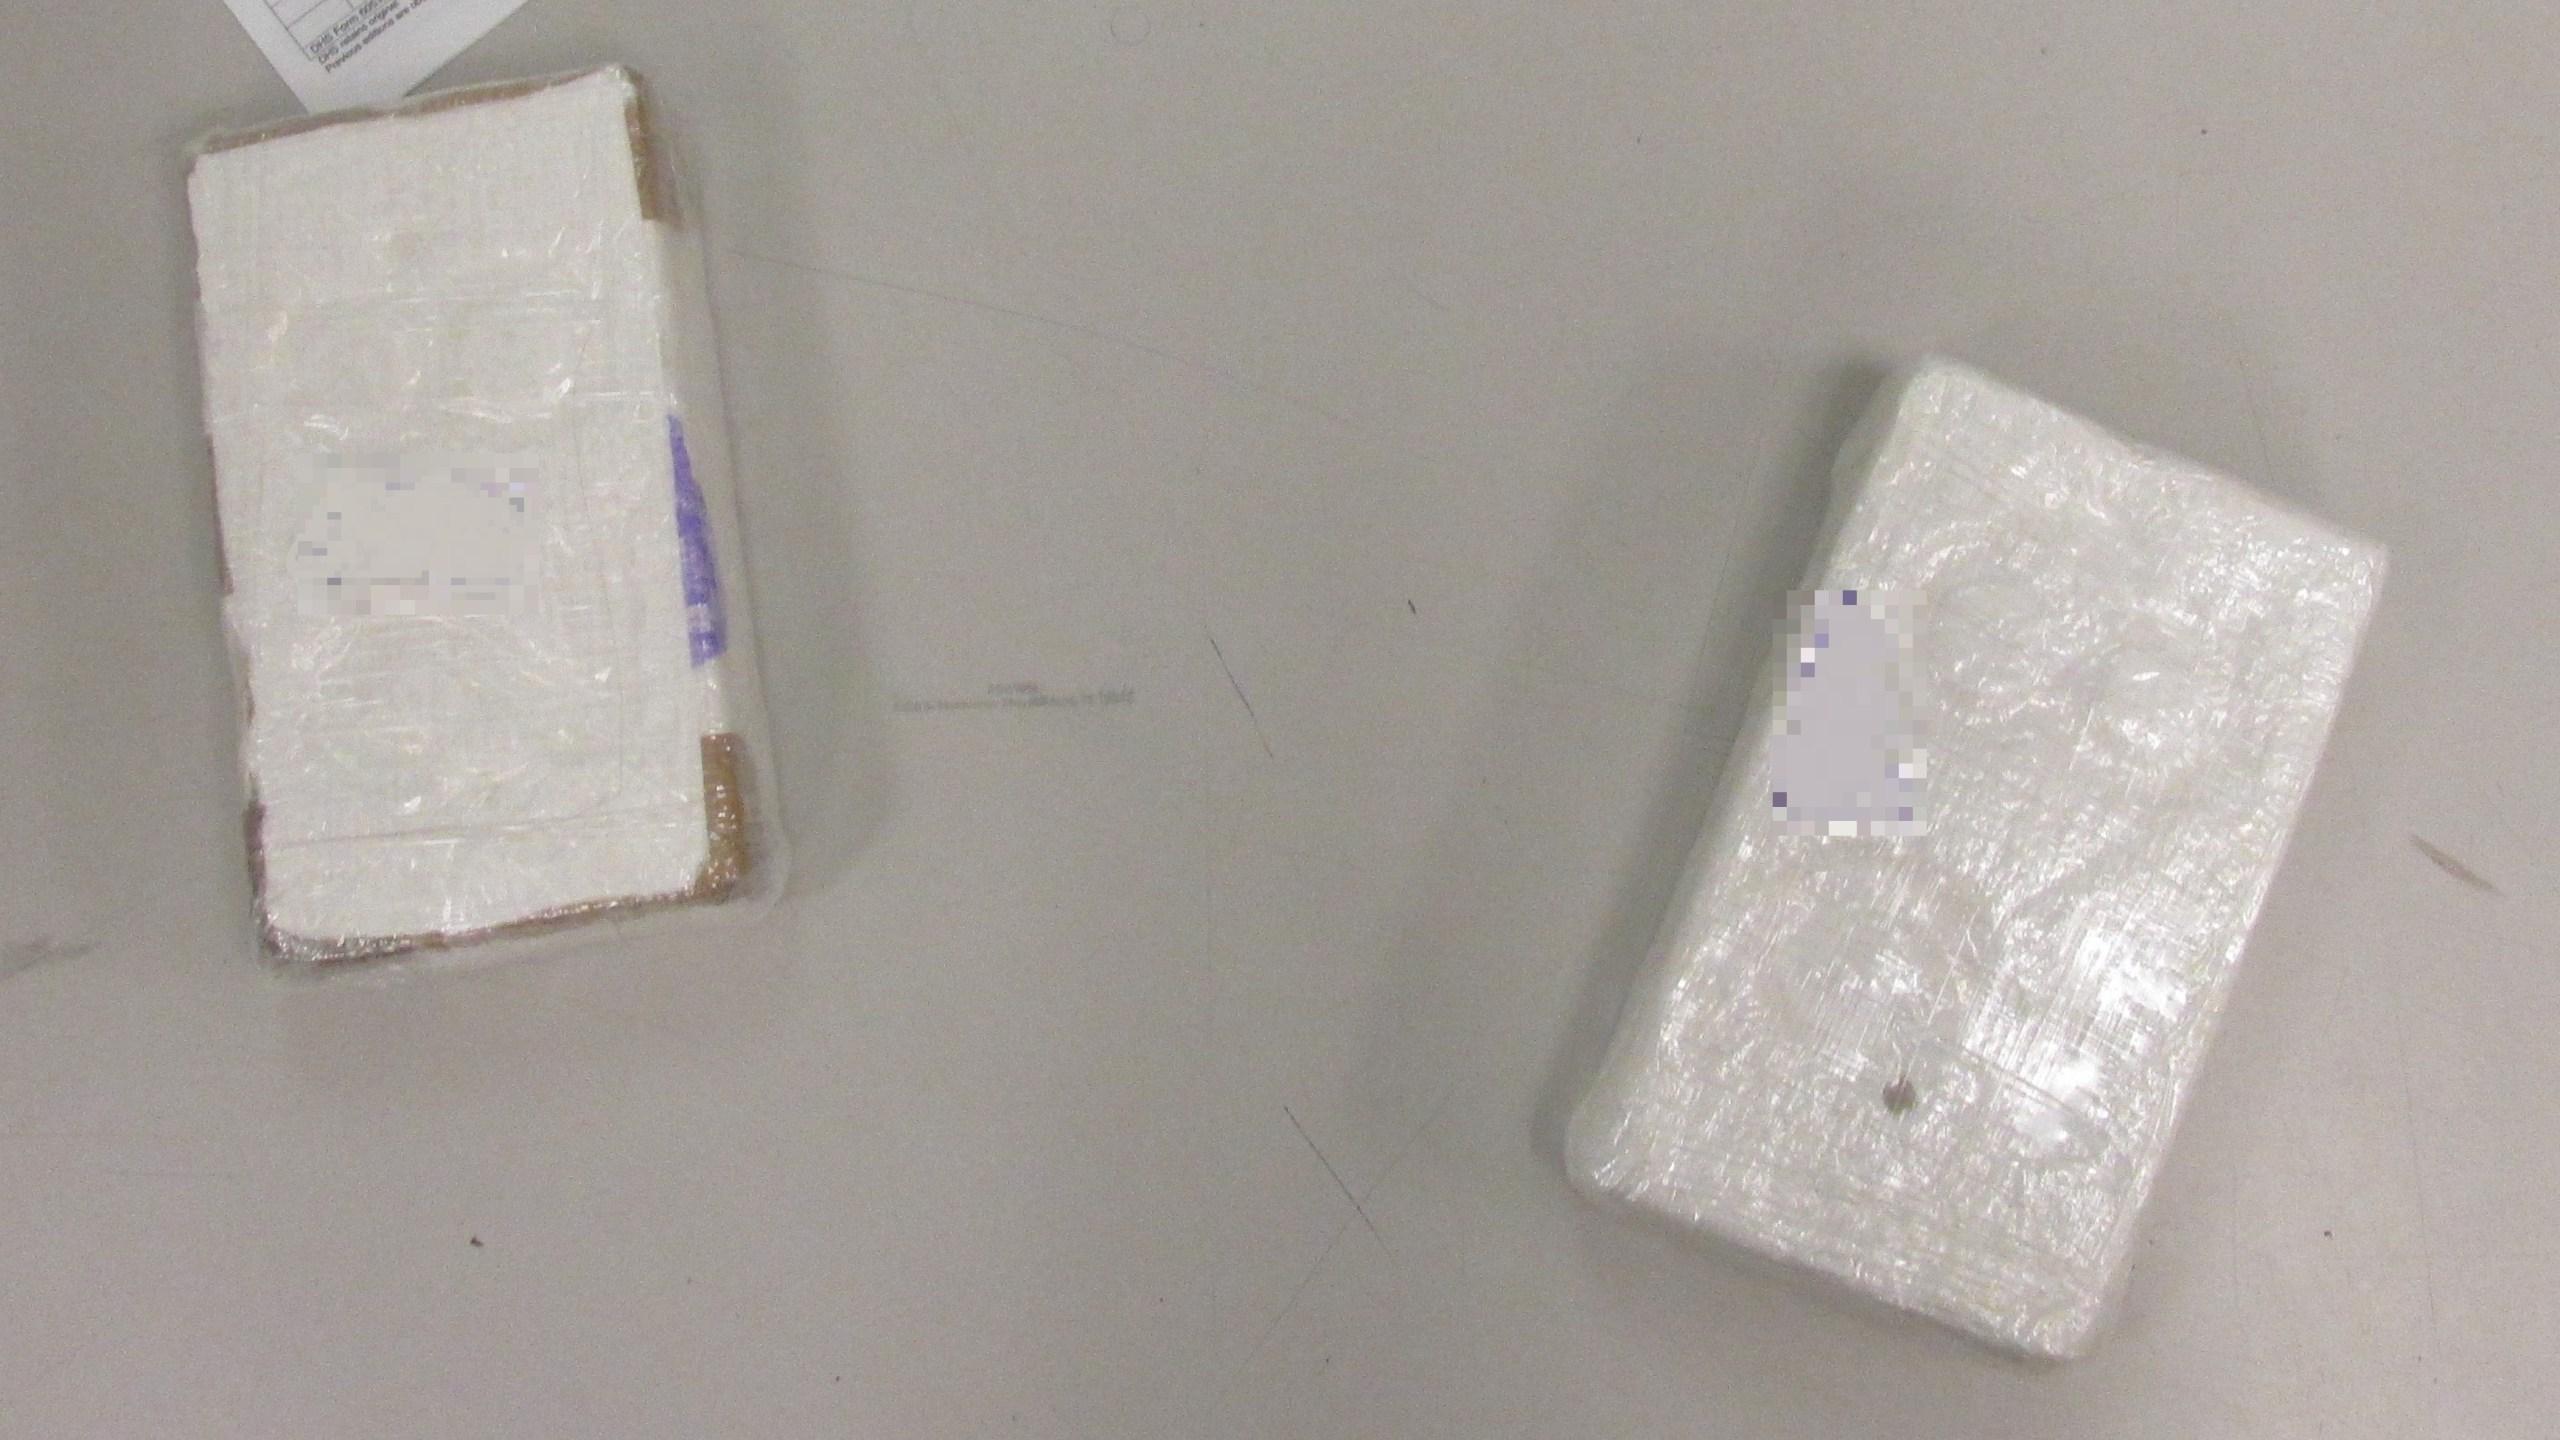 falfurrias cocaine2_1534298504223.JPG.jpg